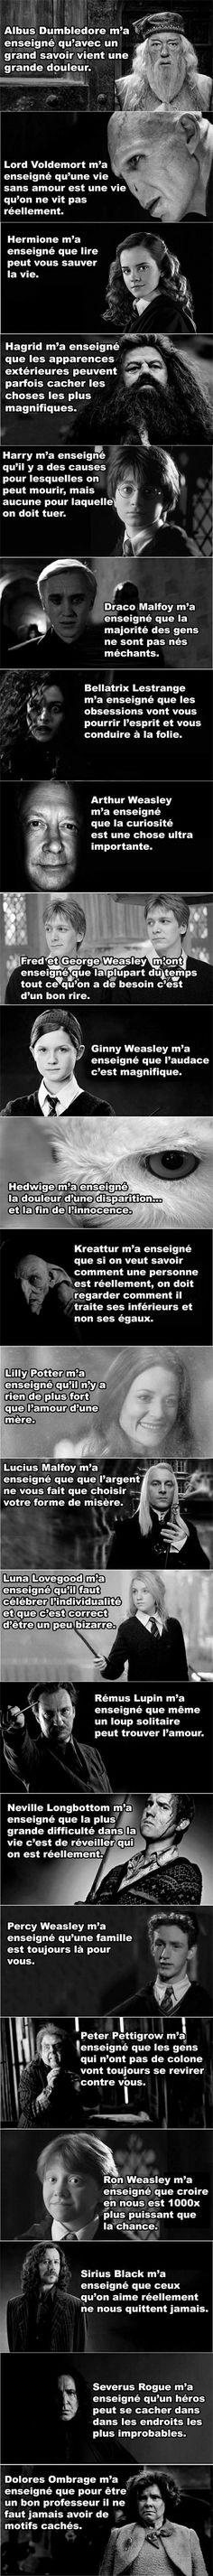 Ideas for memes funny life harry potter Harry Potter Film, Harry Potter Anime, Harry Potter Universal, Harry Potter World, Harry Potter Humour, Always Harry Potter, Jarry Potter, Rage, Movies And Series